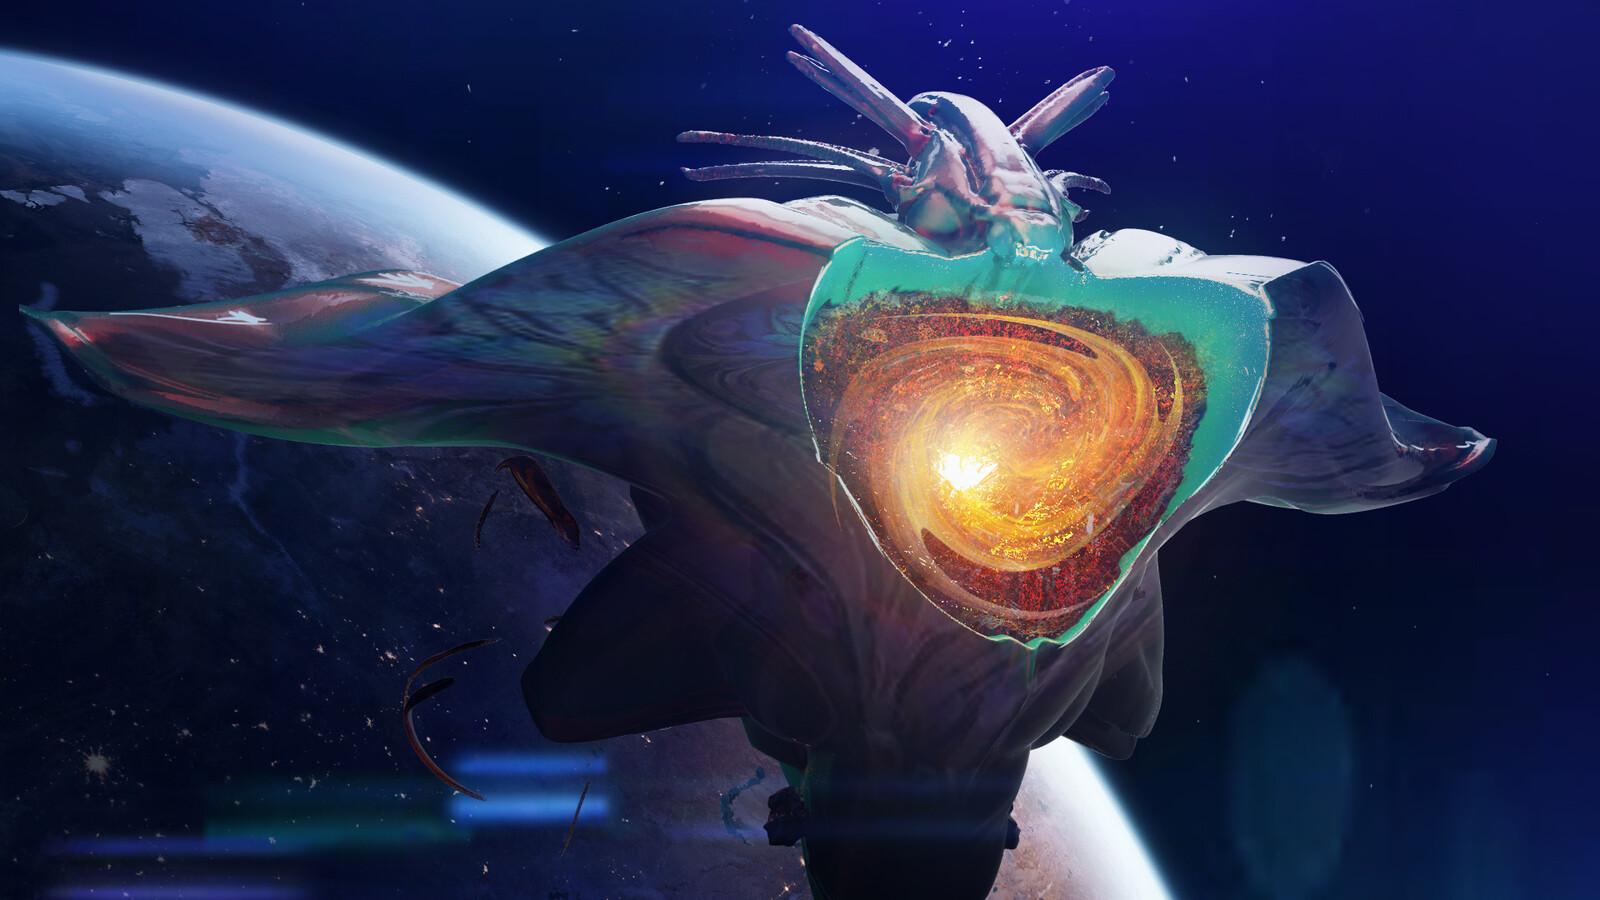 Alien portal ship